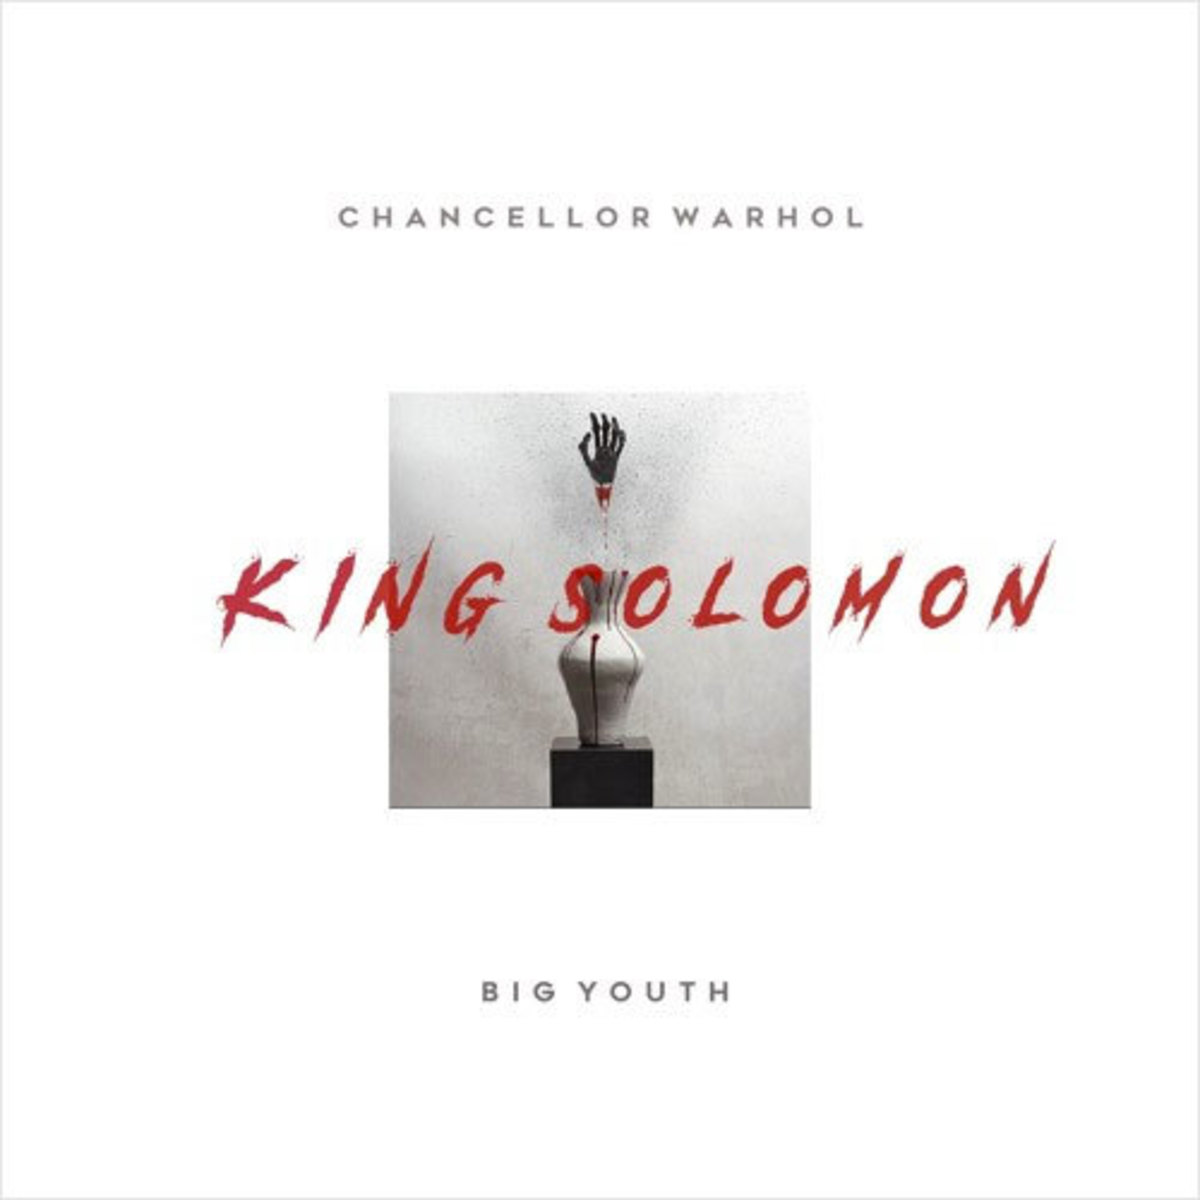 chancellor-warhol-king-solomon.jpg